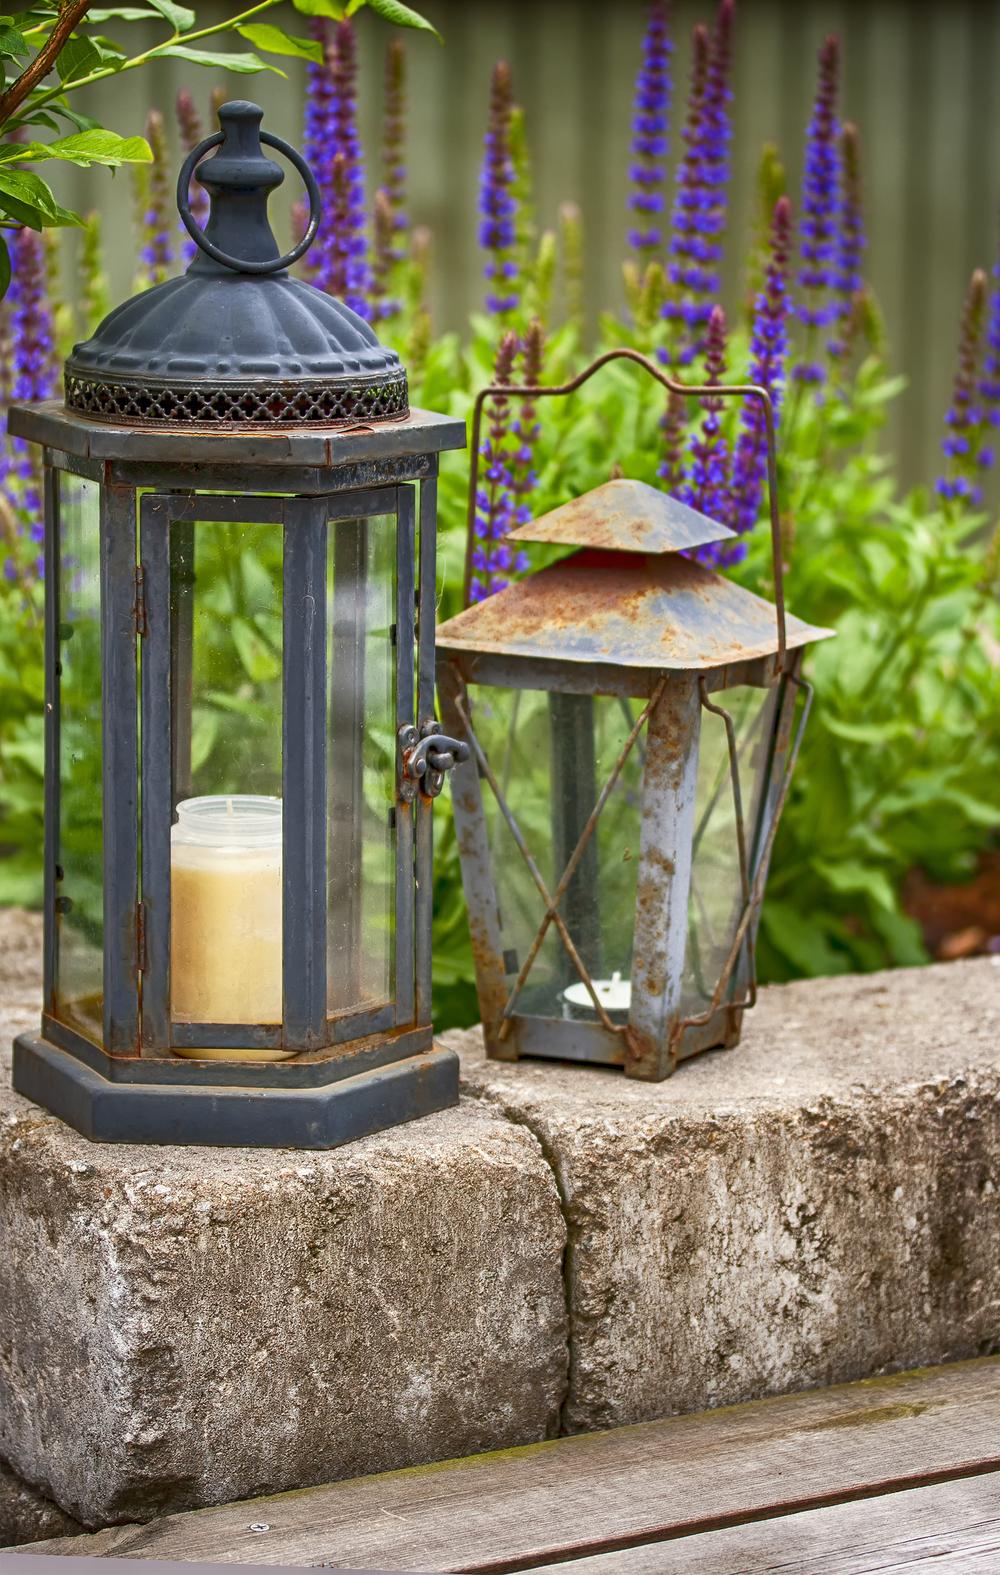 Purchased Lanterns shutterstock_291322772.jpg